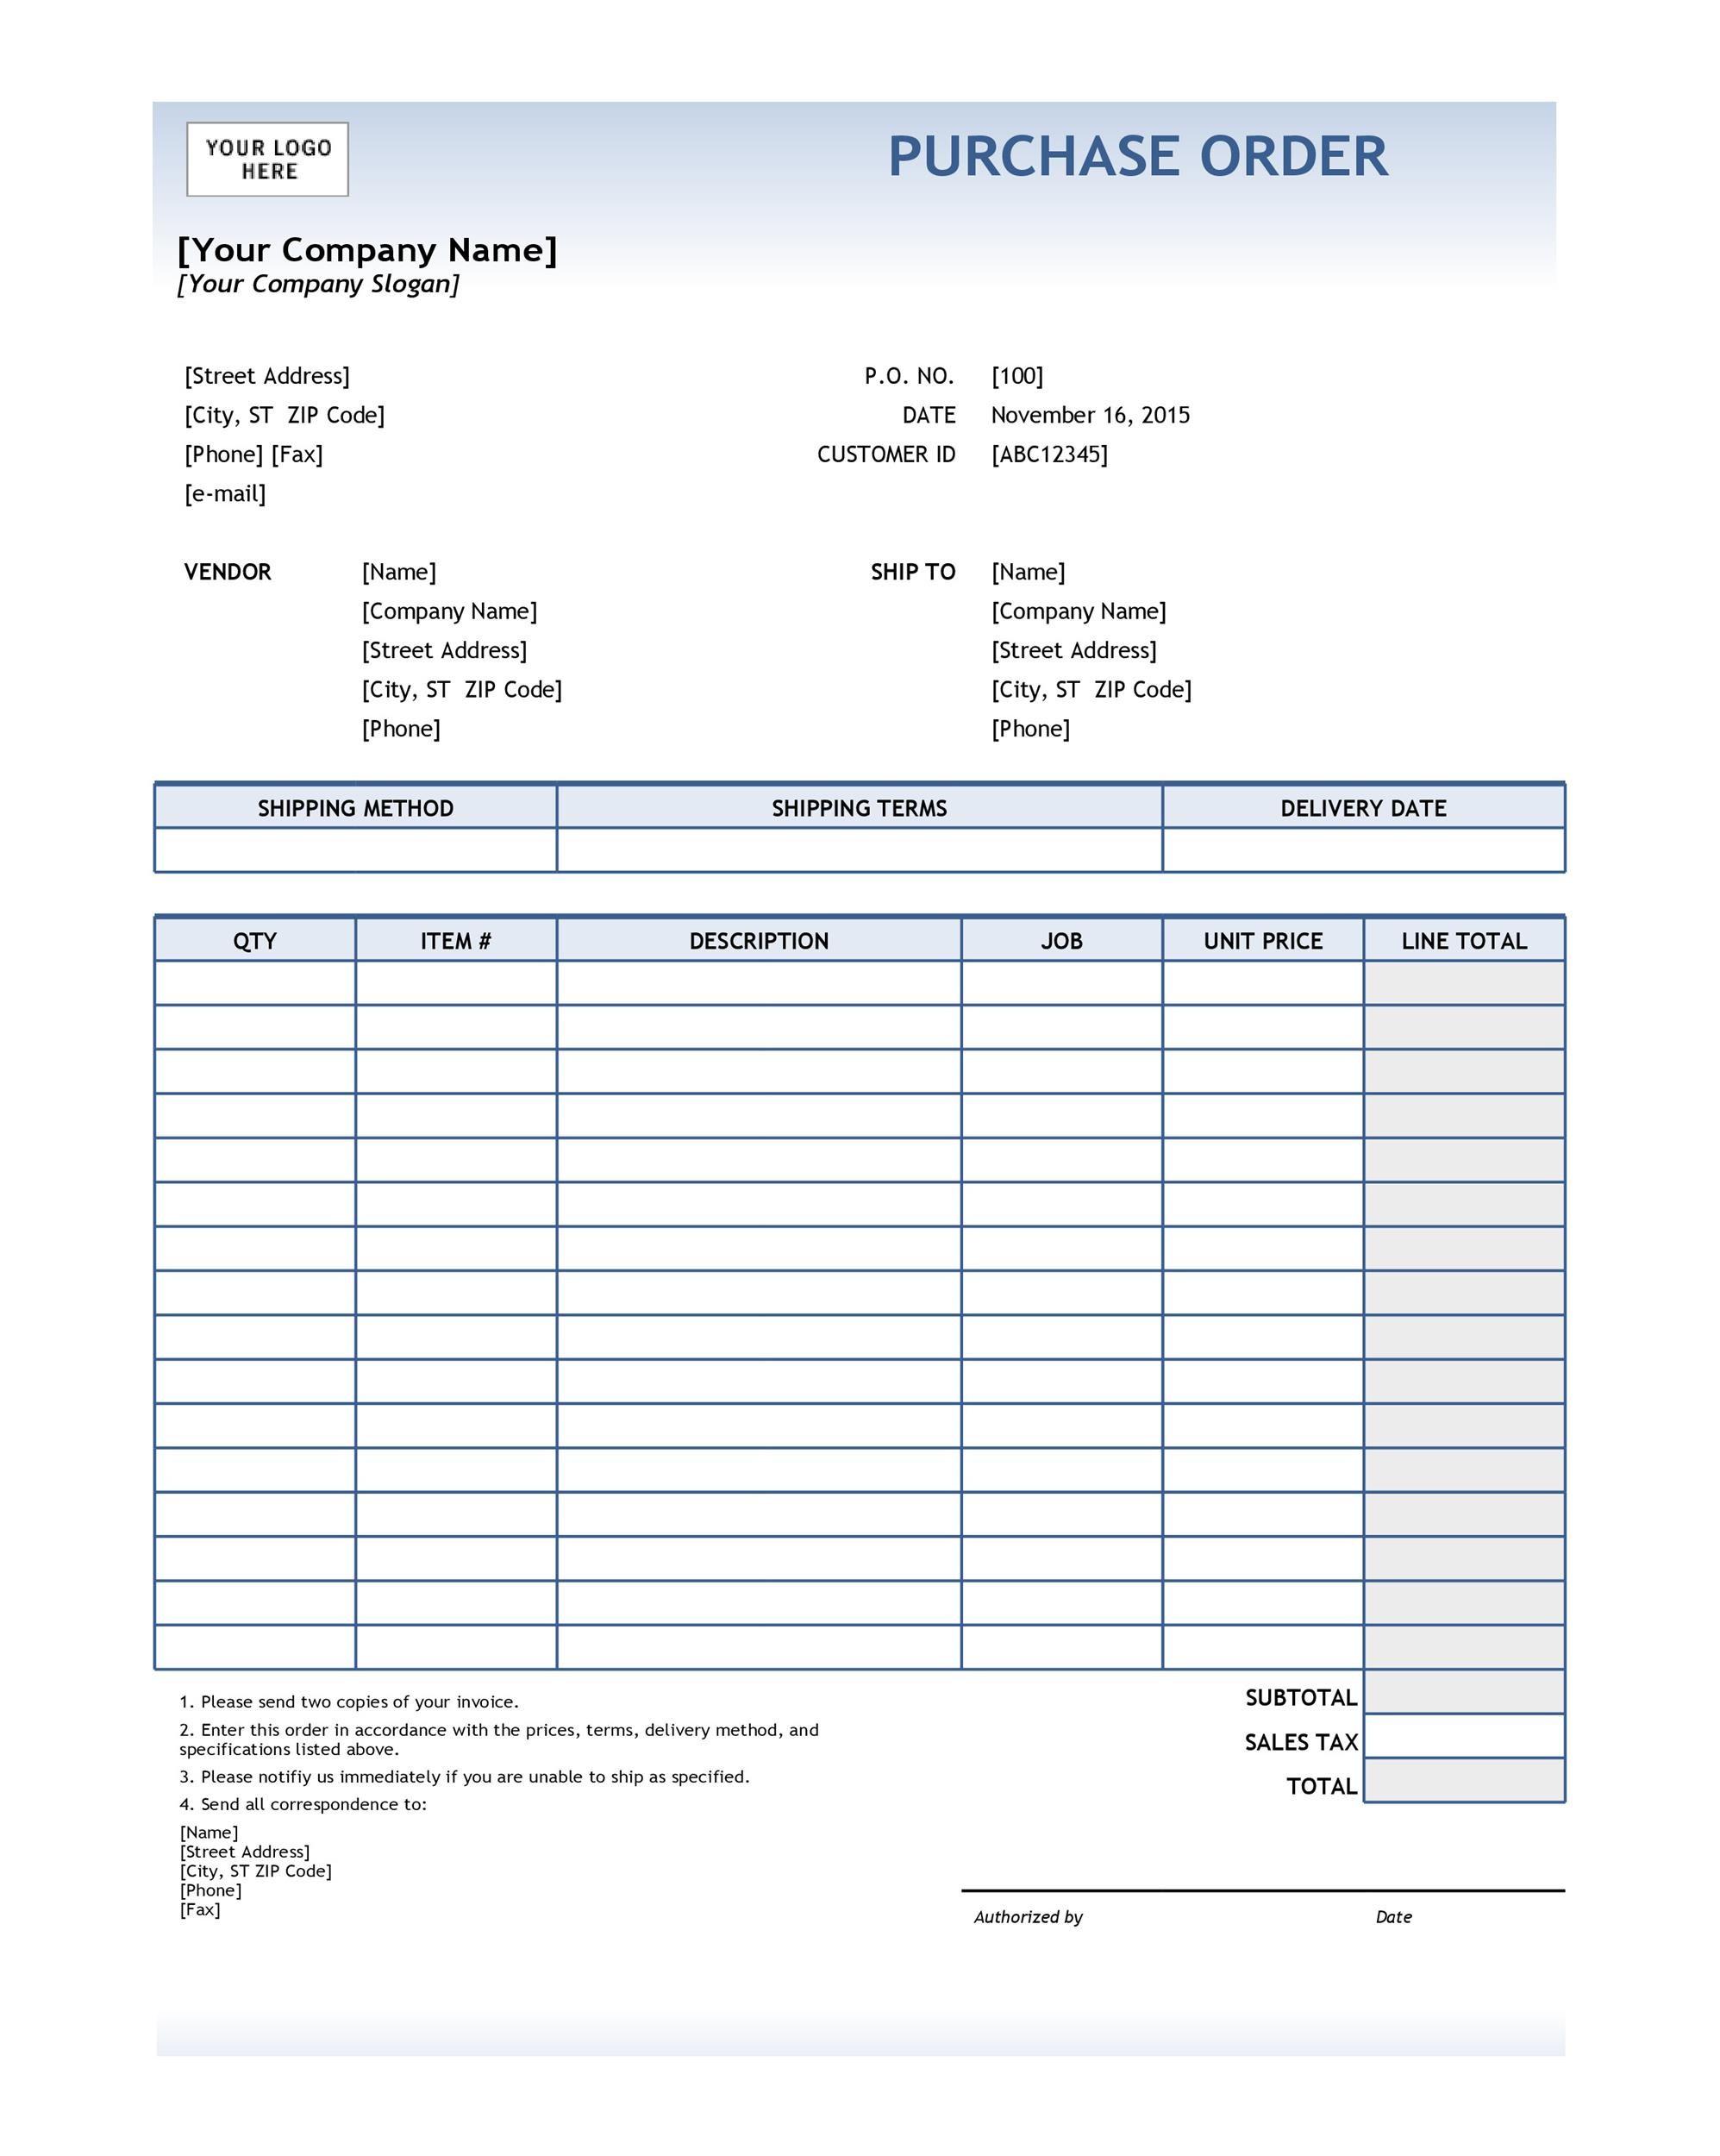 Contoh Surat Purchase Order Dalam Bahasa Indonesia Kumpulan Surat Penting